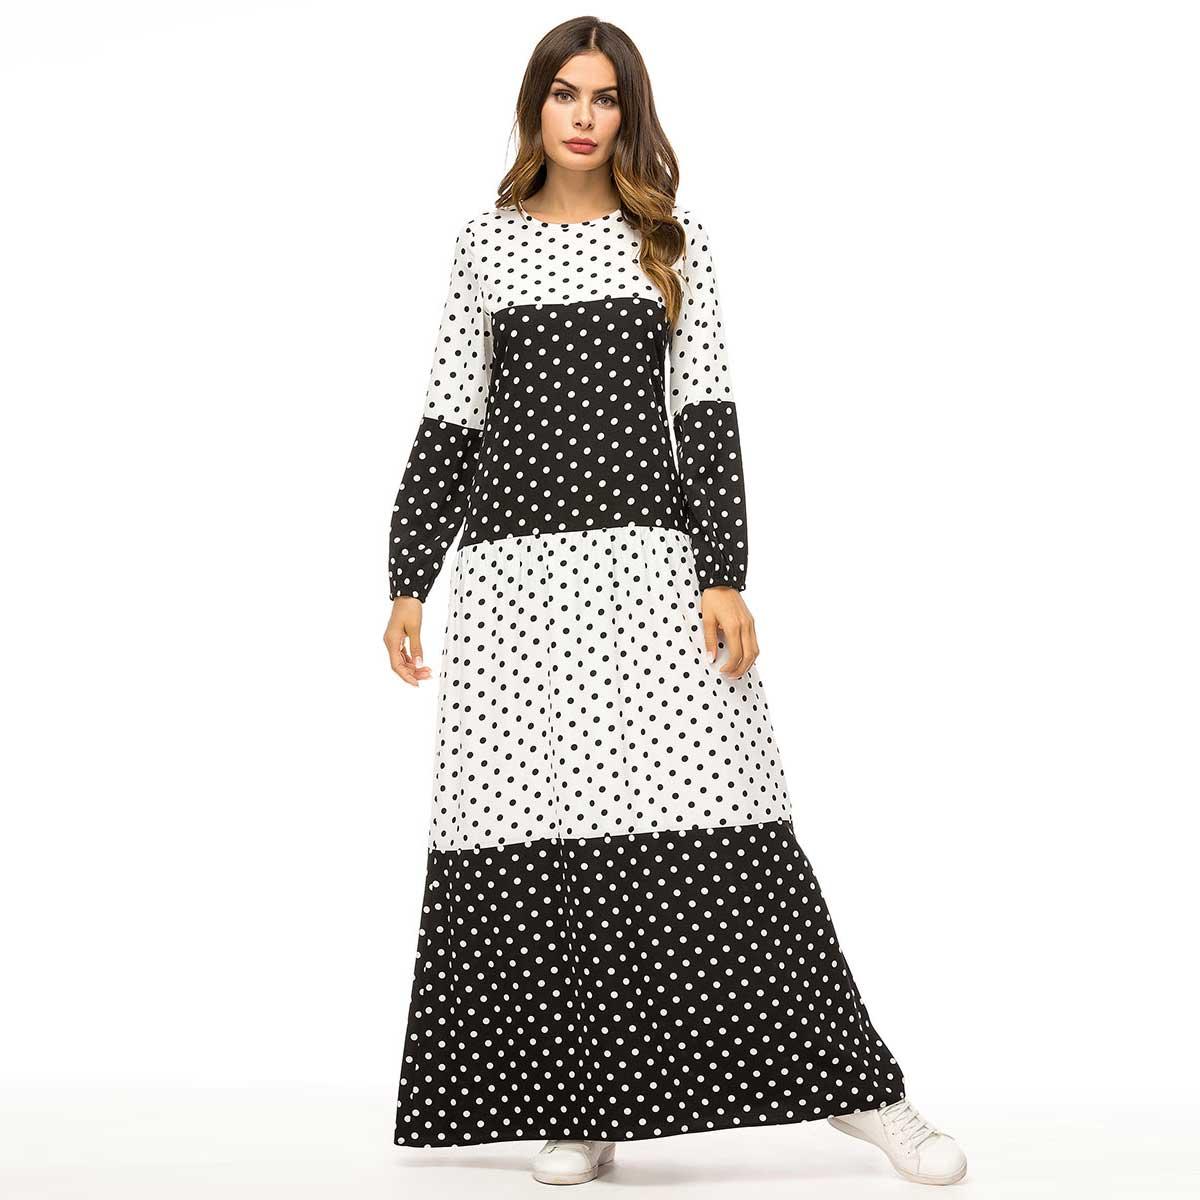 Us 2099 40 Off2019 Black White Polka Dot Print Women Long Dress Urban Muslim Abaya Maxi Vestidos Arab Dubai Uae Qatar Robe Plus Size Vkdr1425 In